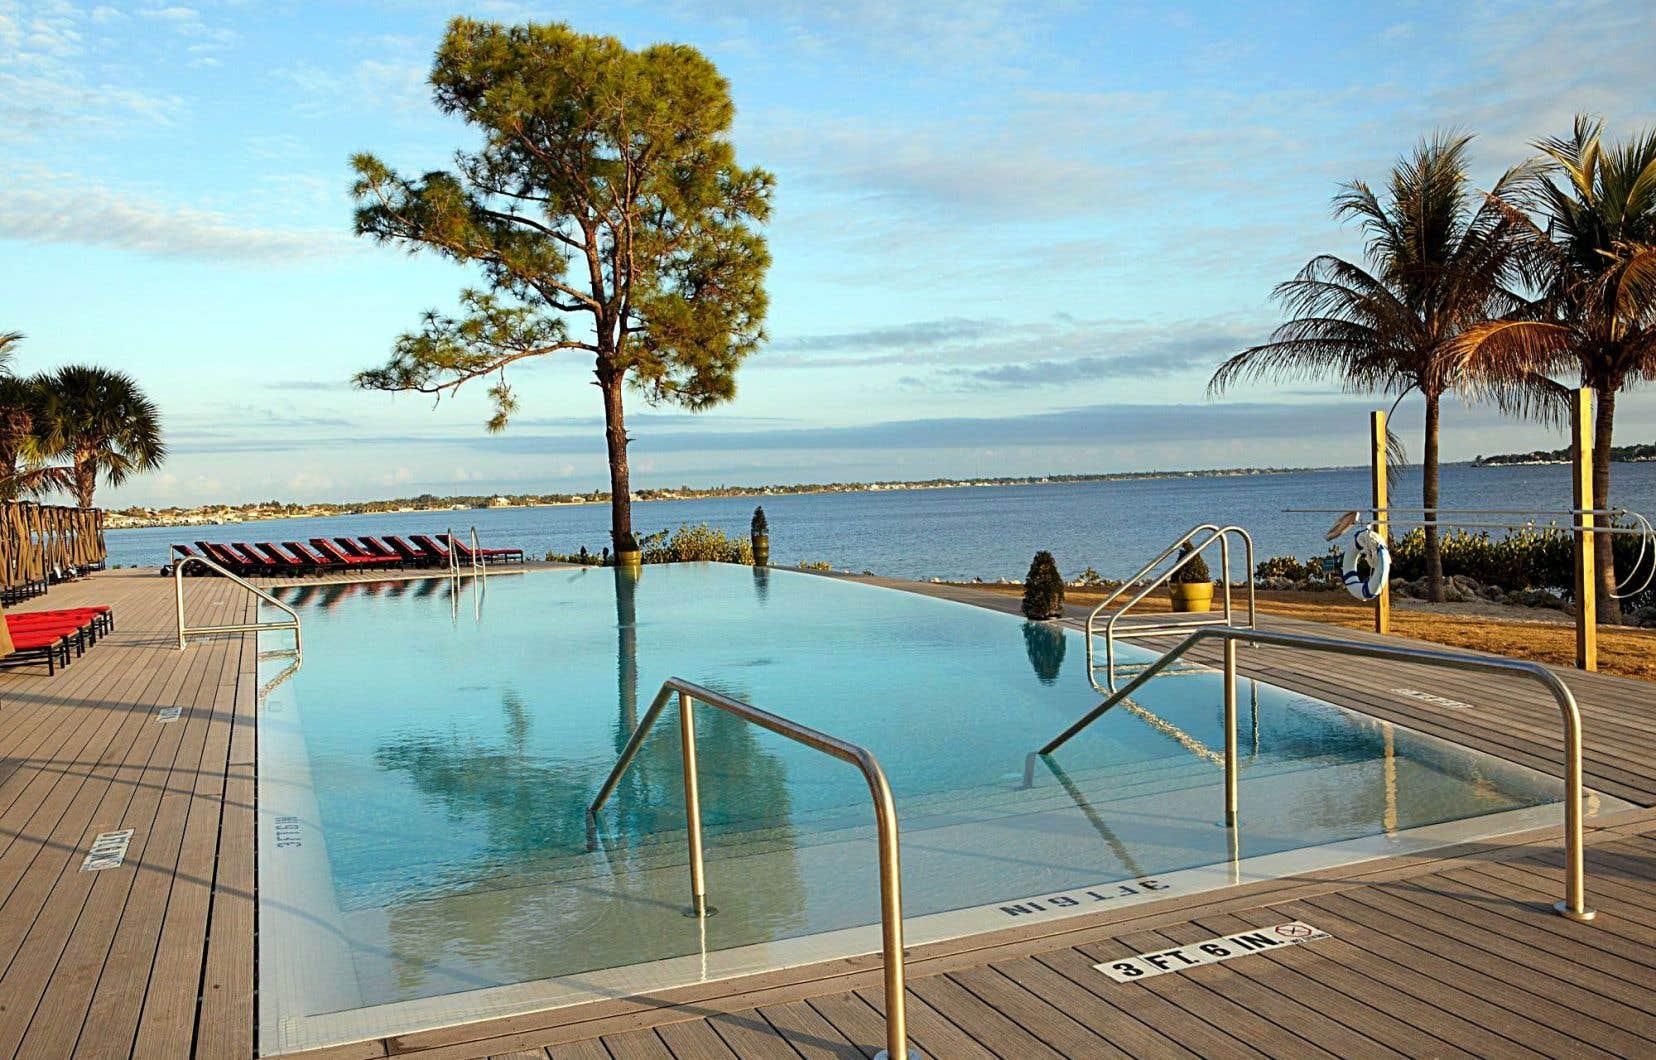 Des piscines rectangulaires constituent l'offre baignade-bronzage.